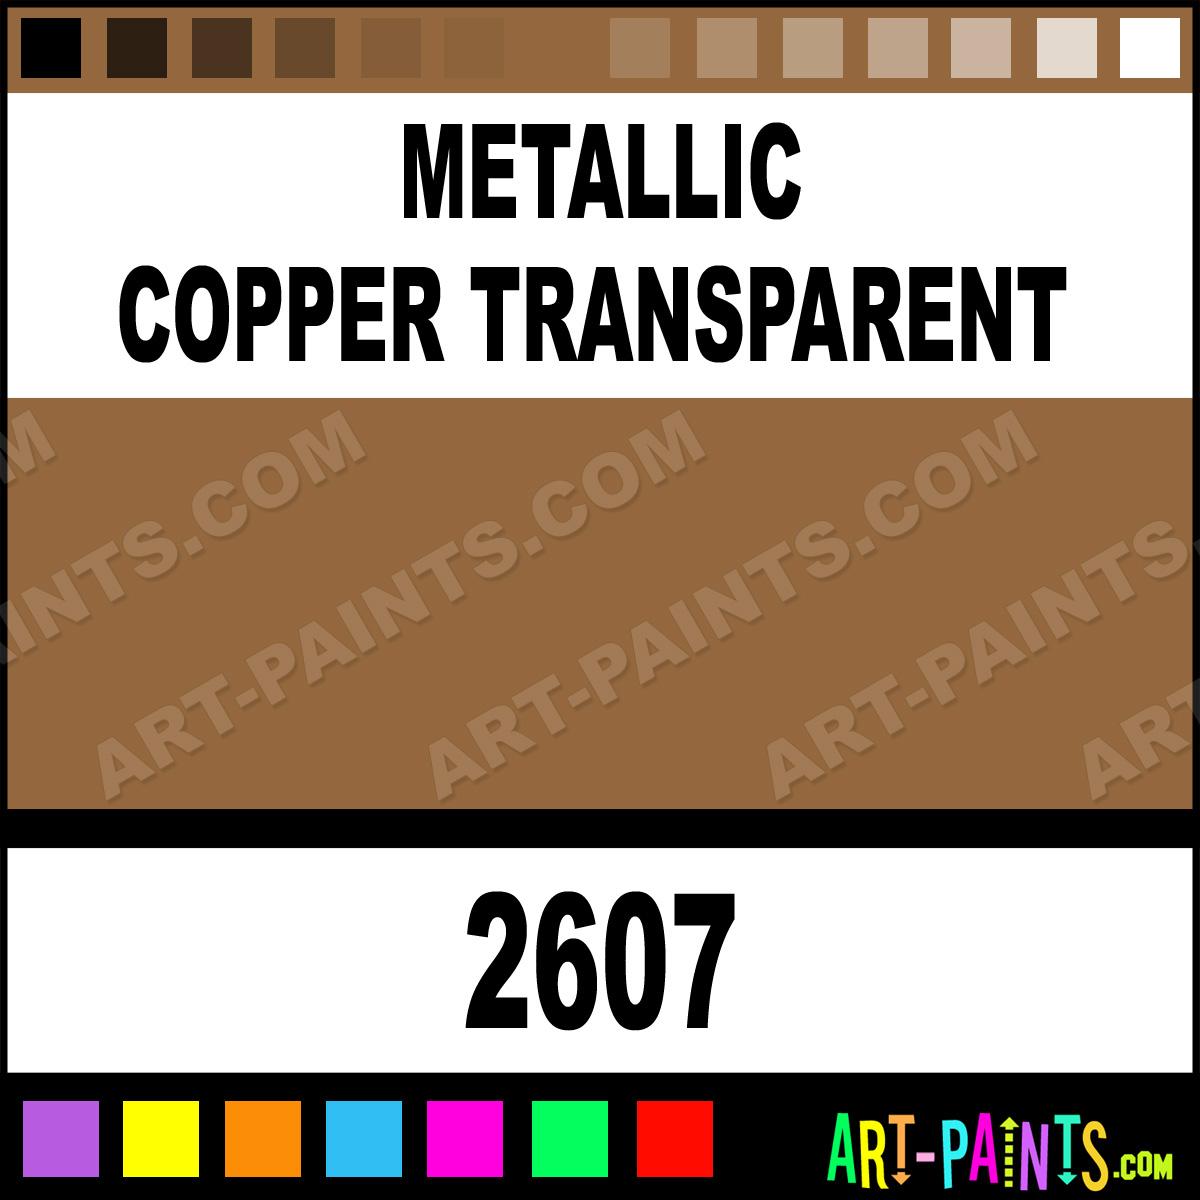 Metallic copper transparent delta acrylic paints 2607 metallic metallic copper transparent paint 2607 by ceramcoat delta paints nvjuhfo Choice Image